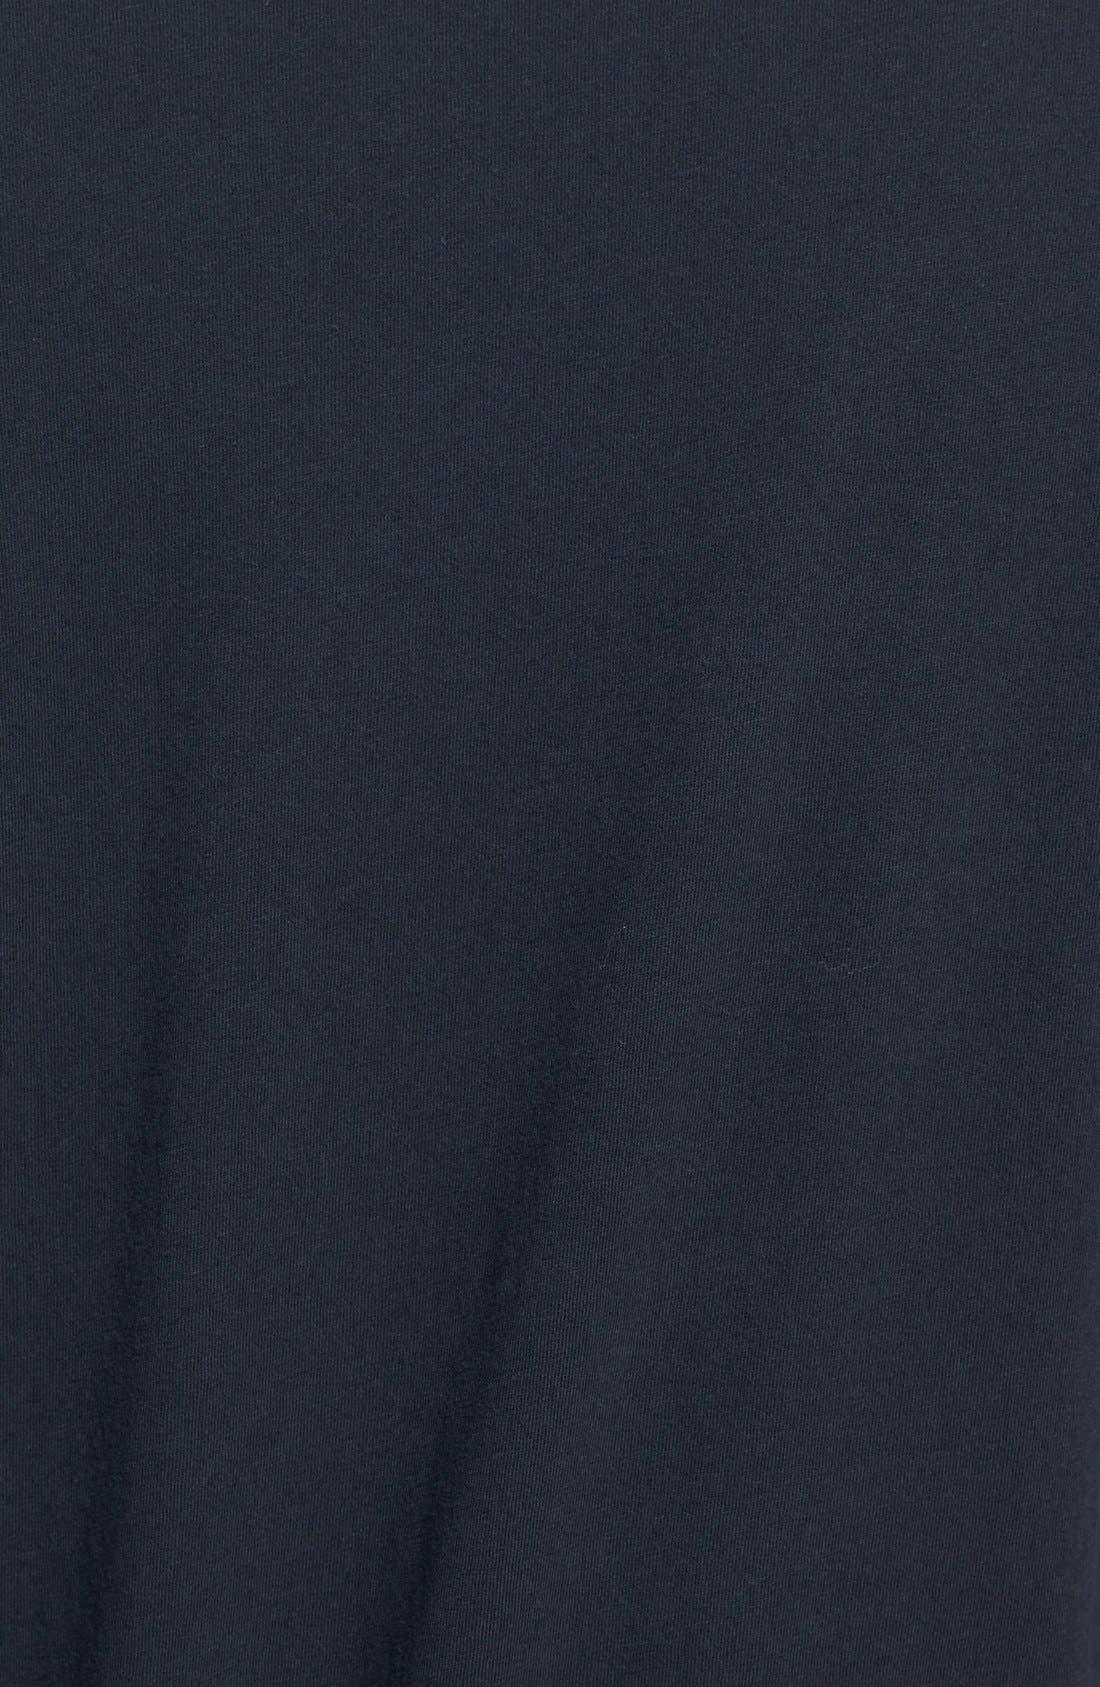 Long Sleeve Crewneck T-Shirt,                             Alternate thumbnail 3, color,                             001